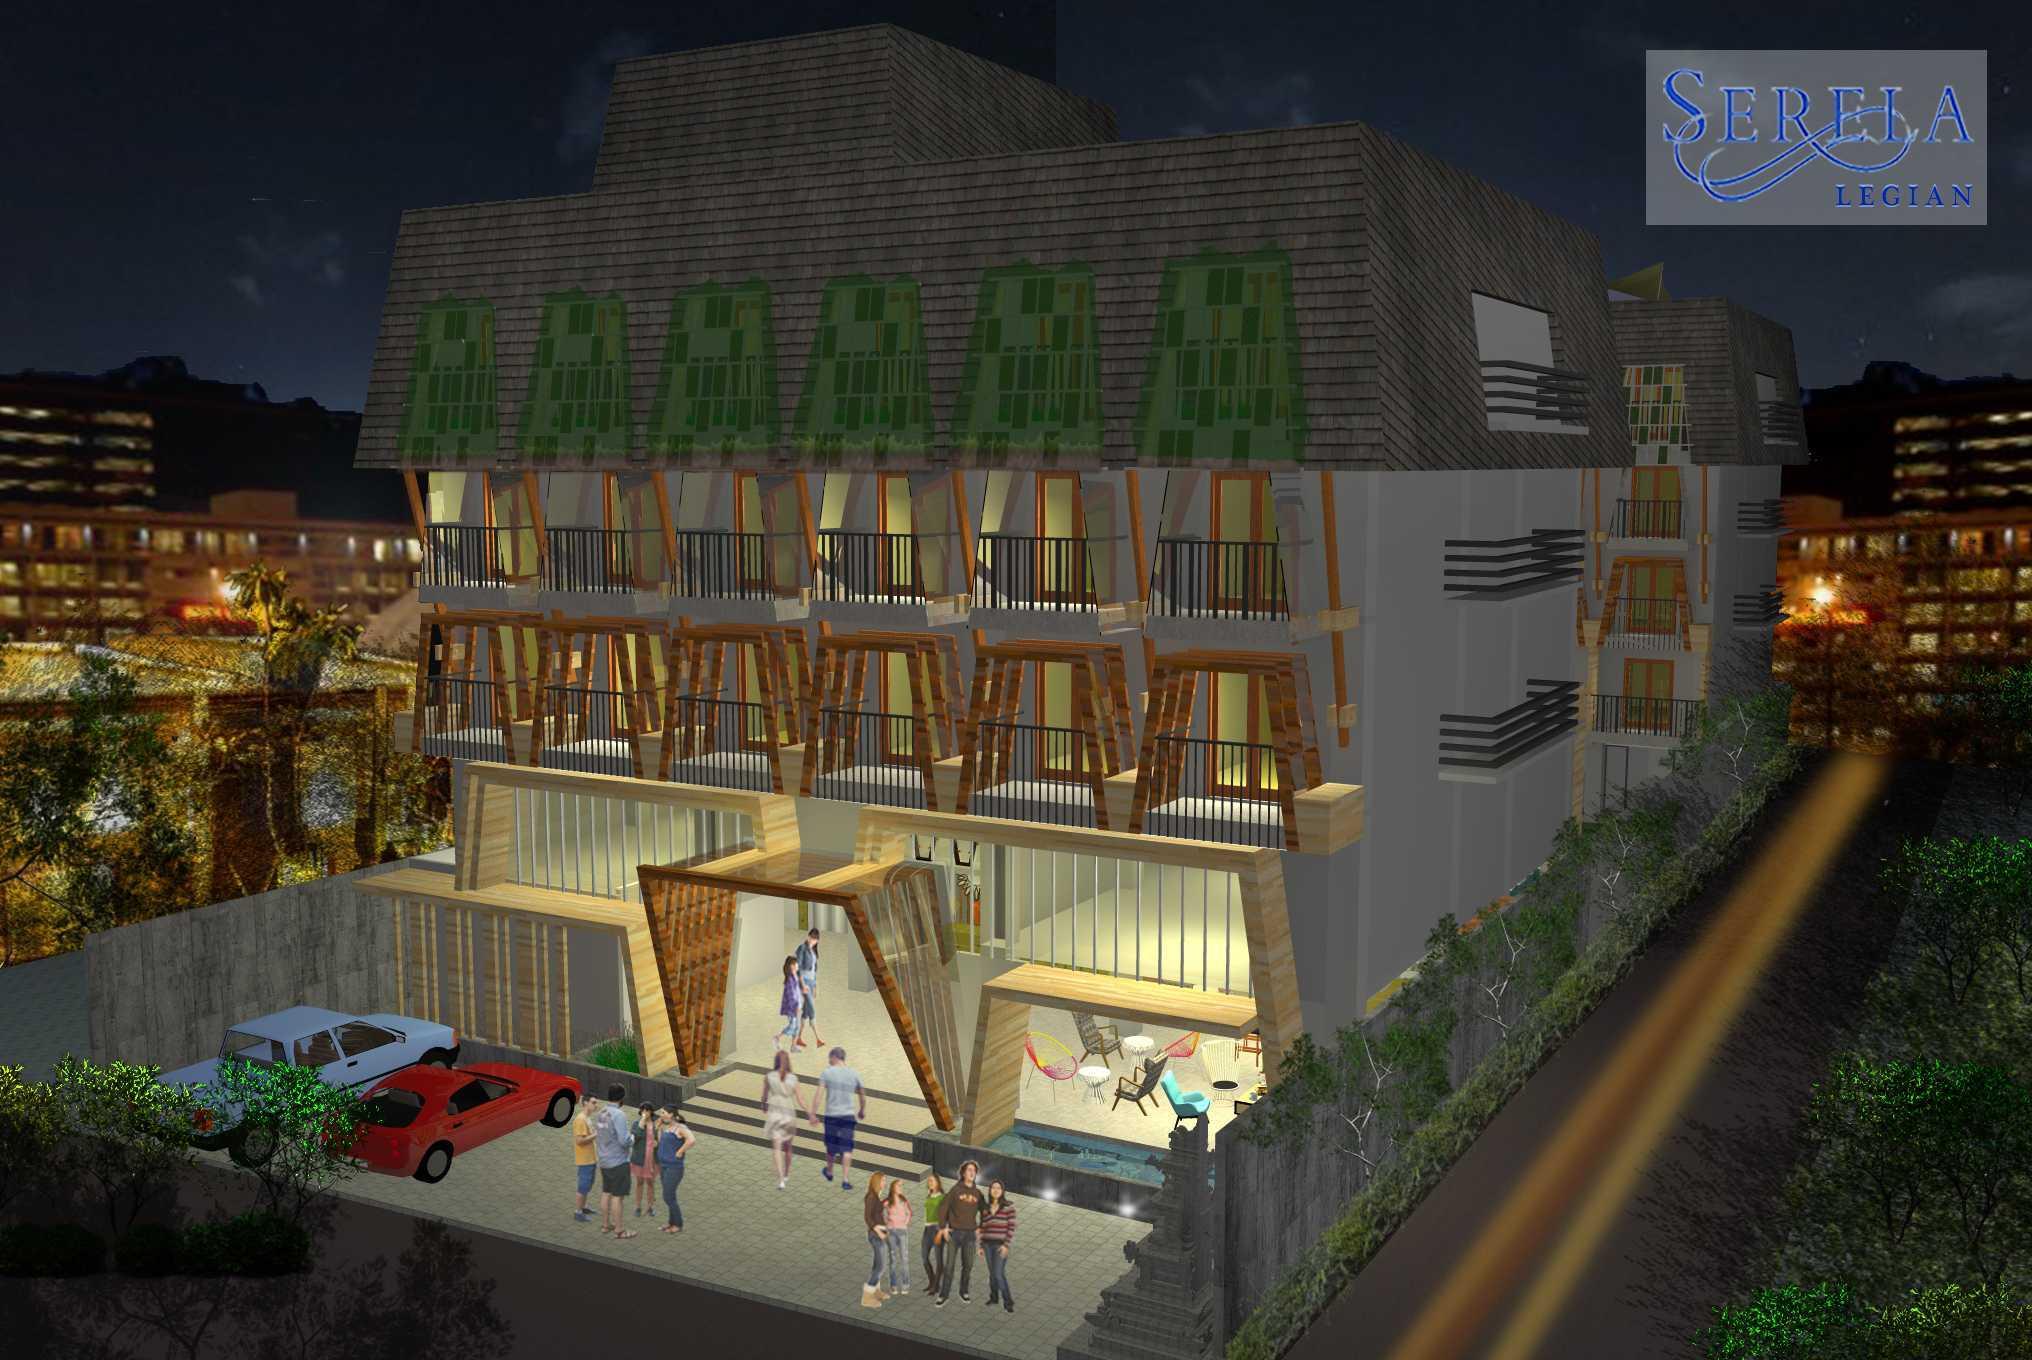 Melly Purnamahildha Tarman Grand Serela Legian Hotel Legian, Bali Legian, Bali Night View   20462